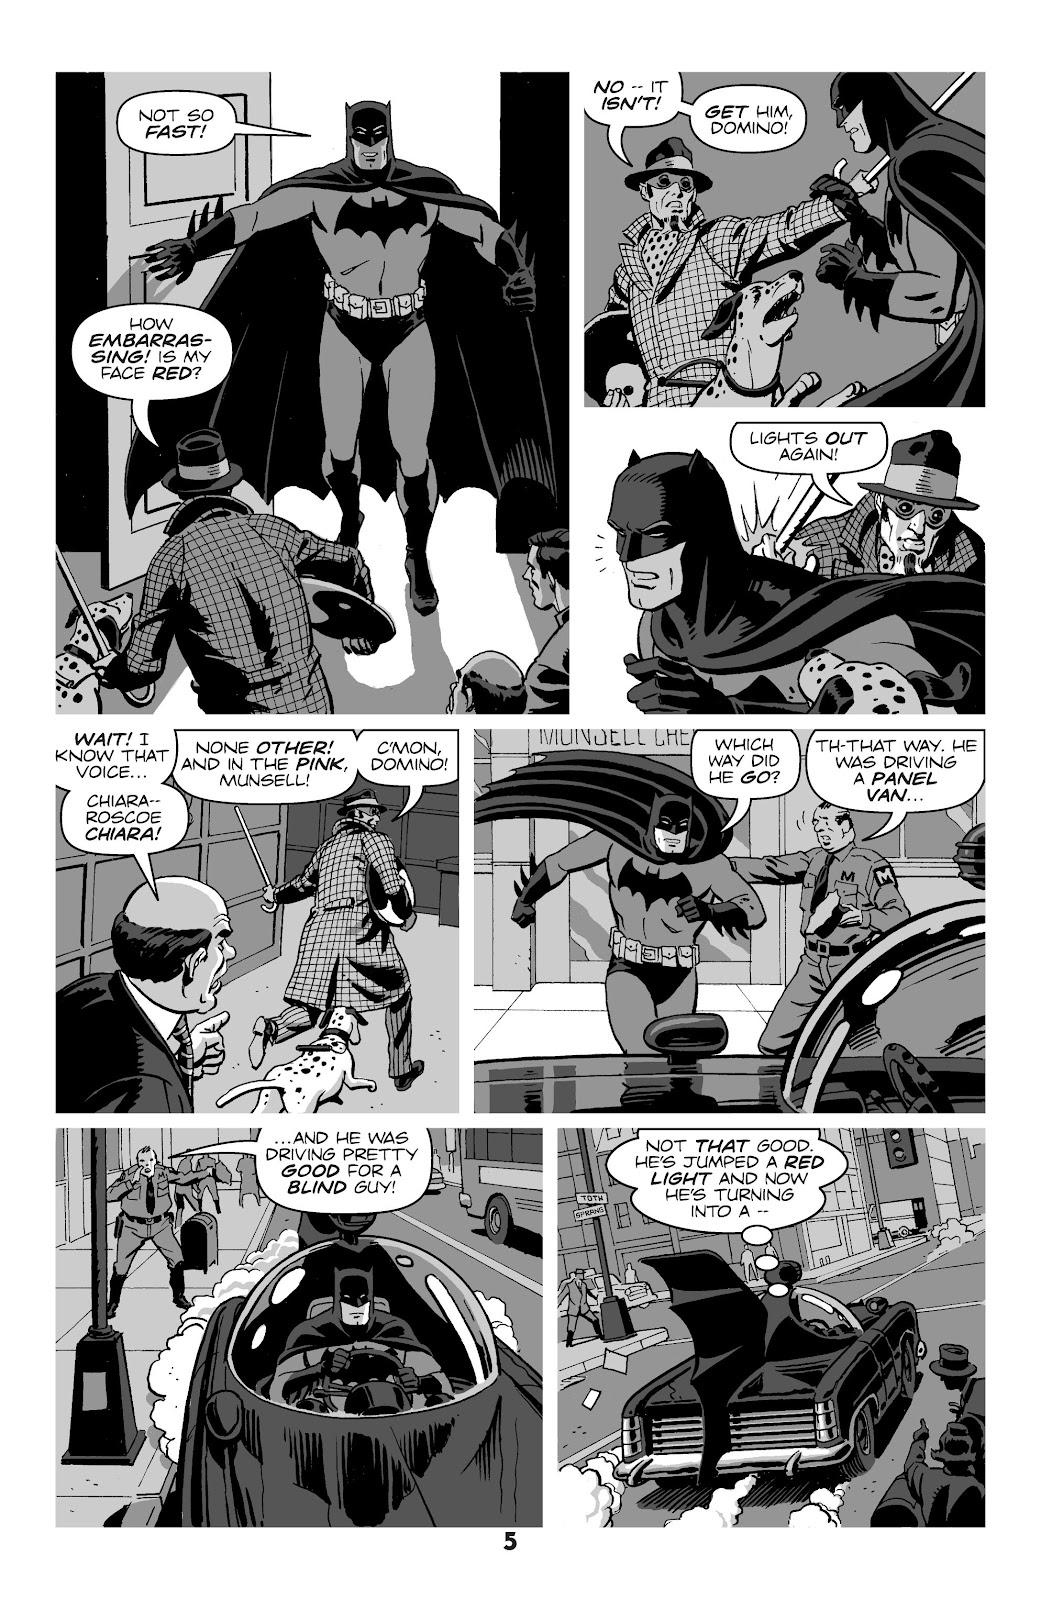 Batman Gotham Knights 012 | Read All Comics Online For Free